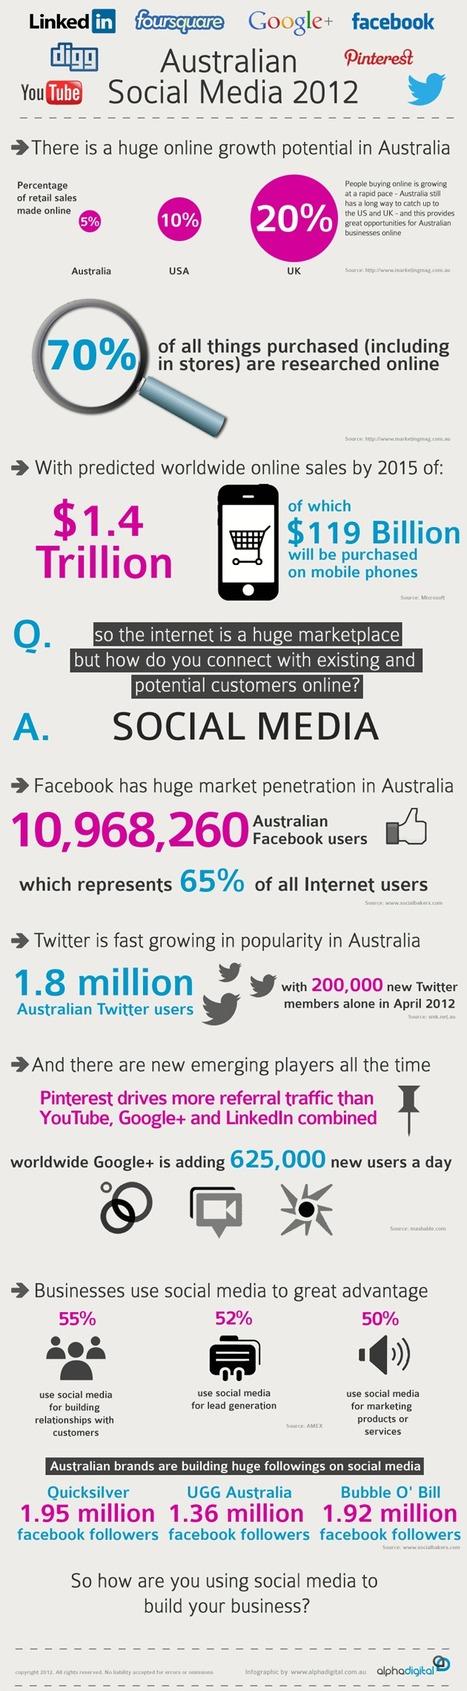 Social Media In Australia 2012 | #Infographic | Social-Business-Marketing | Scoop.it